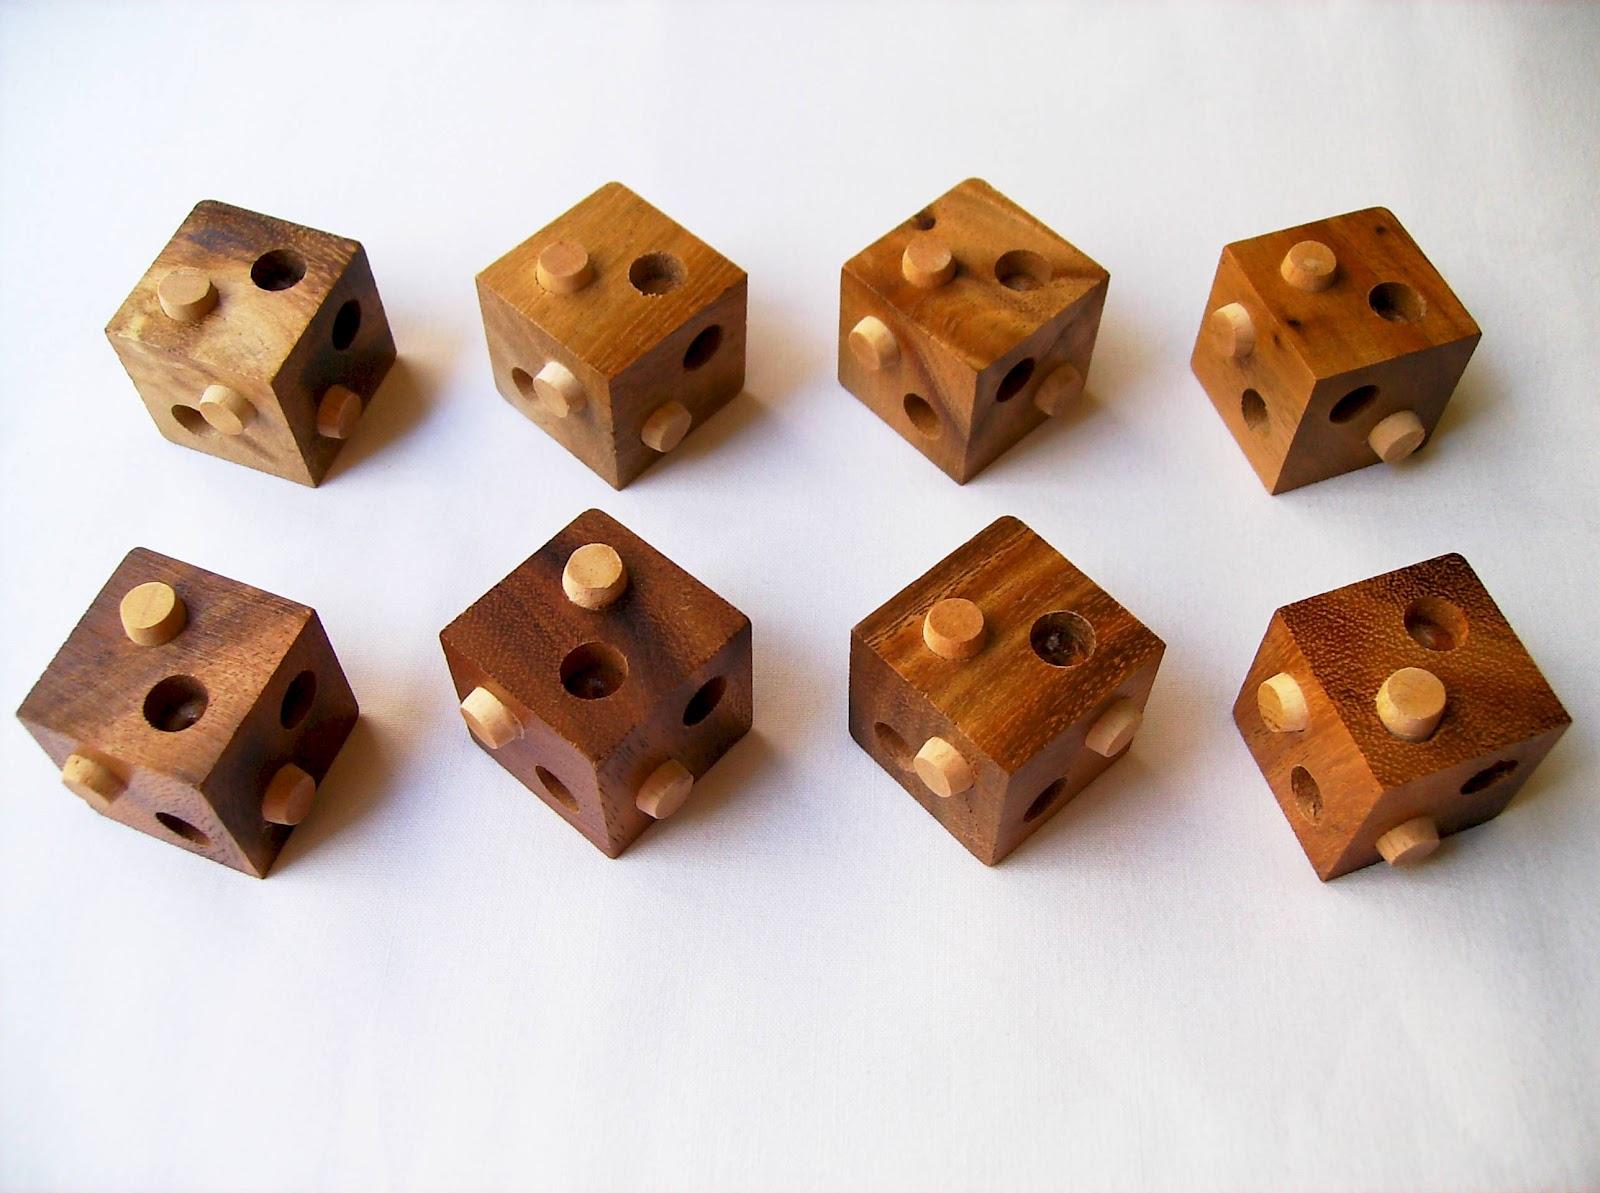 Gabriel Fernandes' Puzzle Collection: March 2012